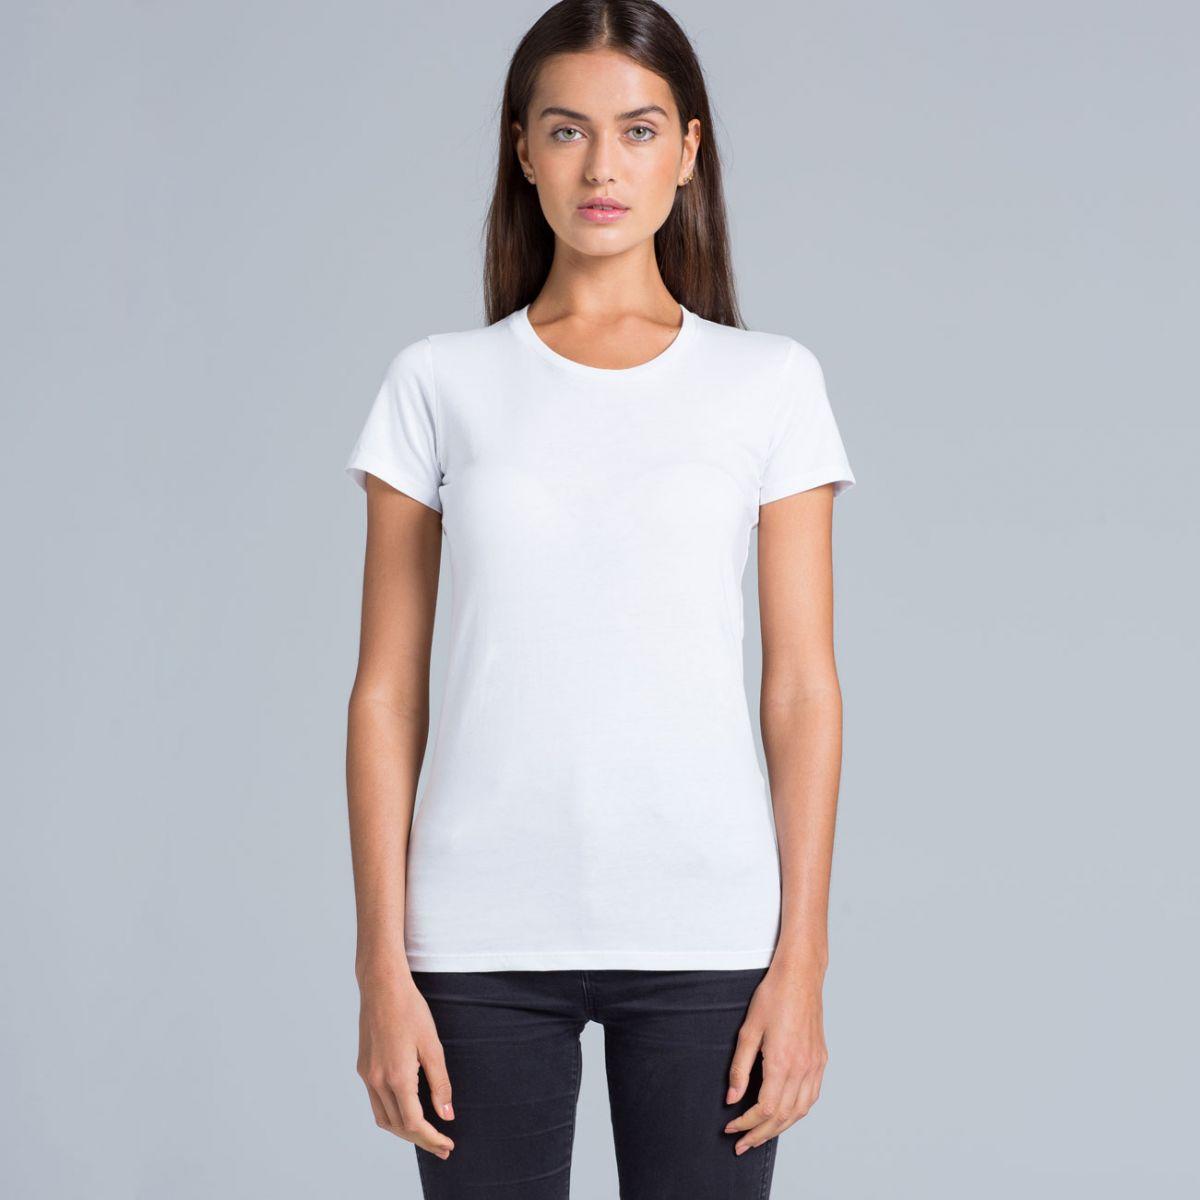 T shirt white colour - T Shirt White Colour 36